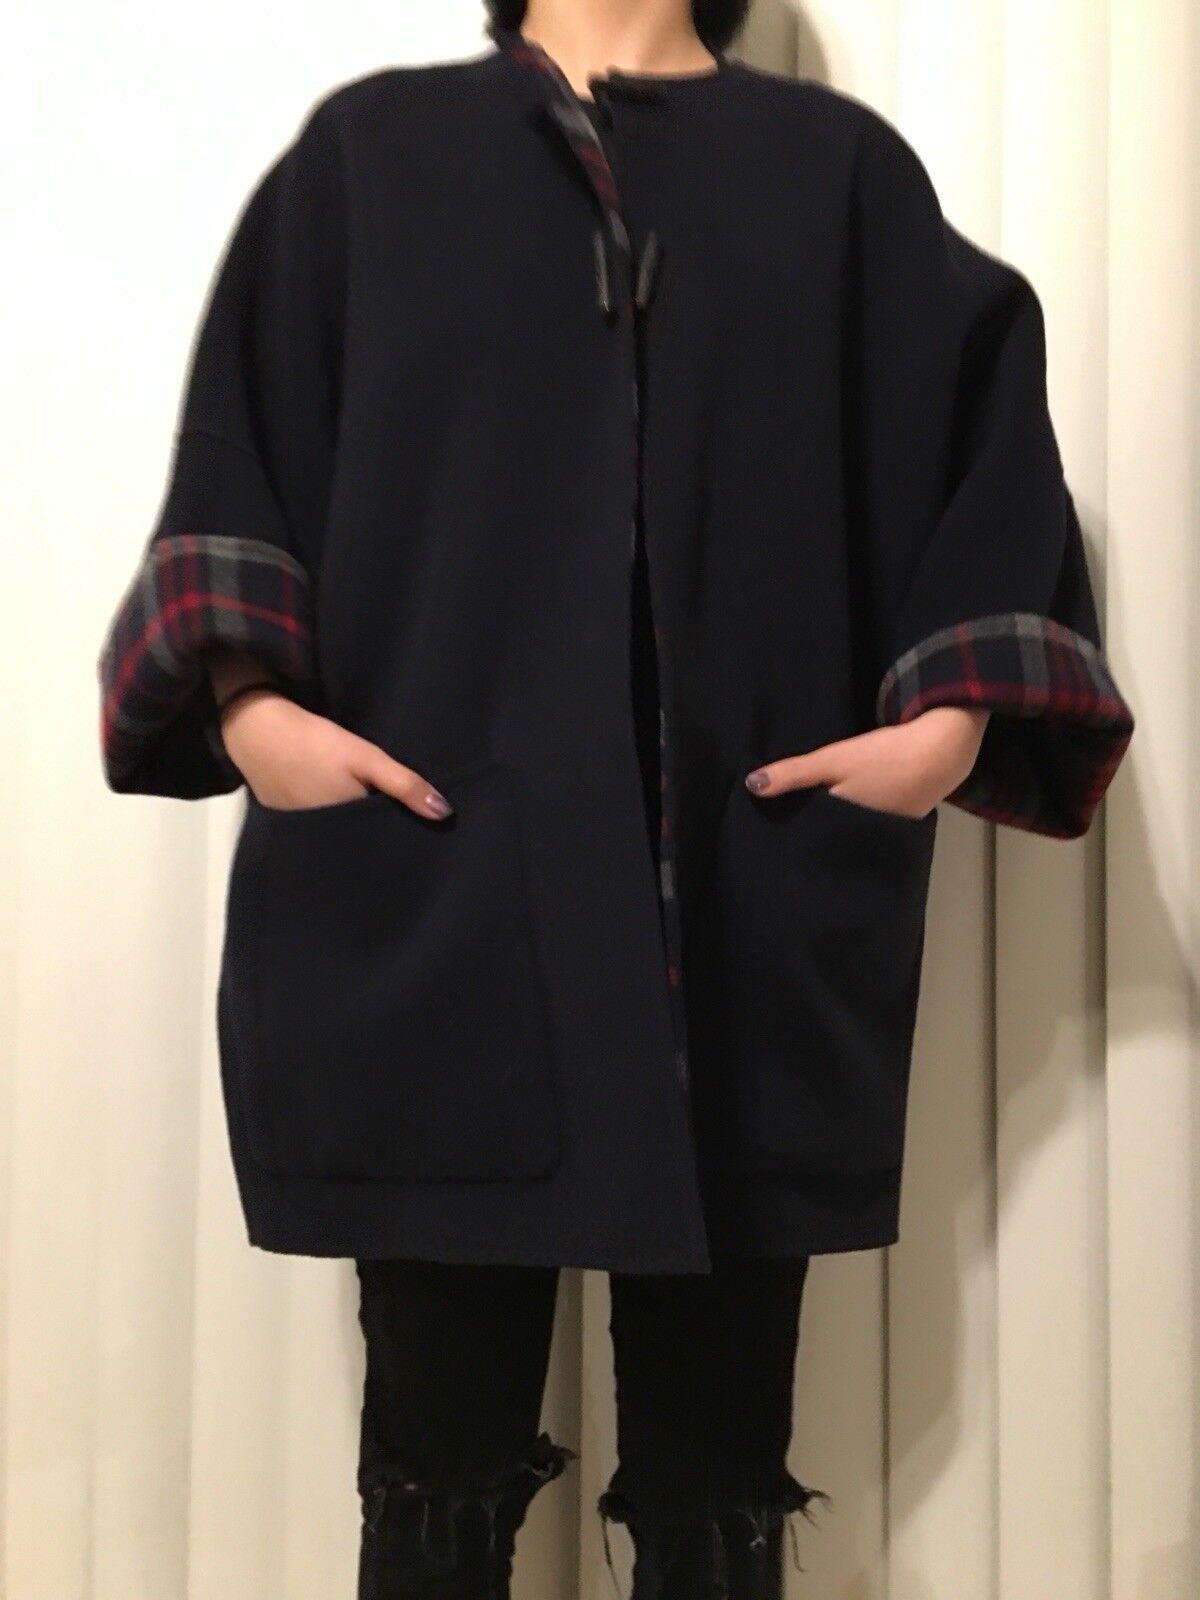 BRAND NEW Carolina Herrera Double Sided Wool Coat Women Size Xs